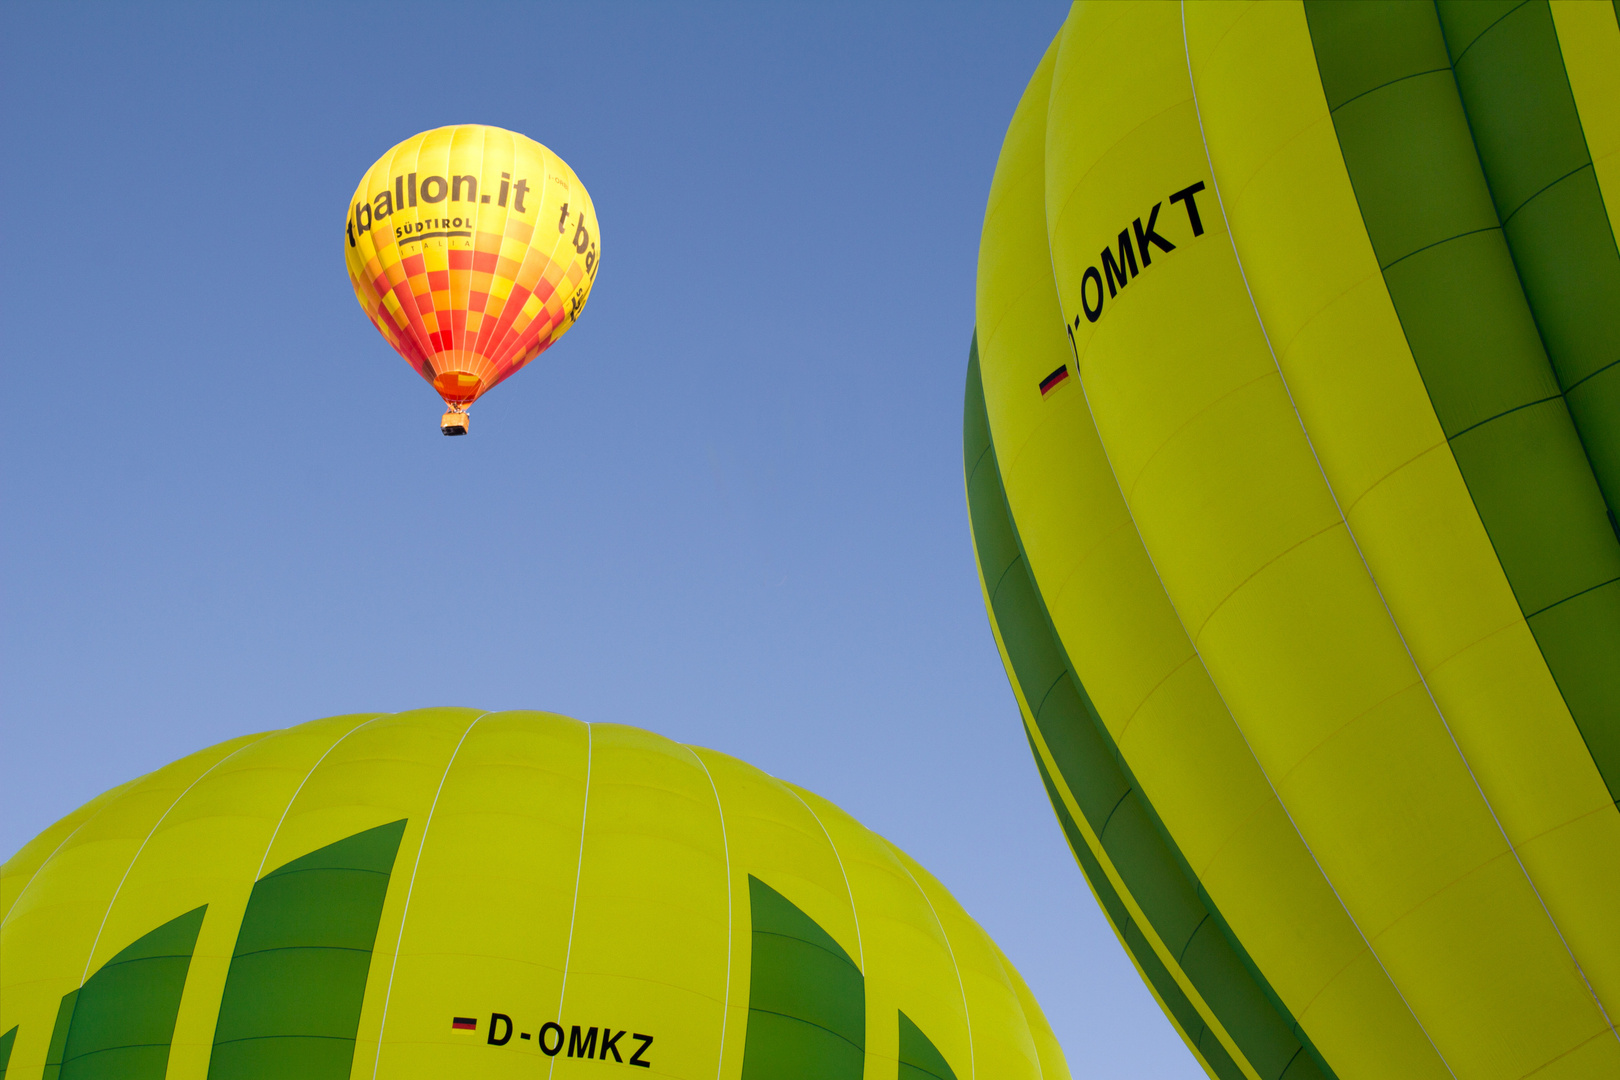 Ballone erleben